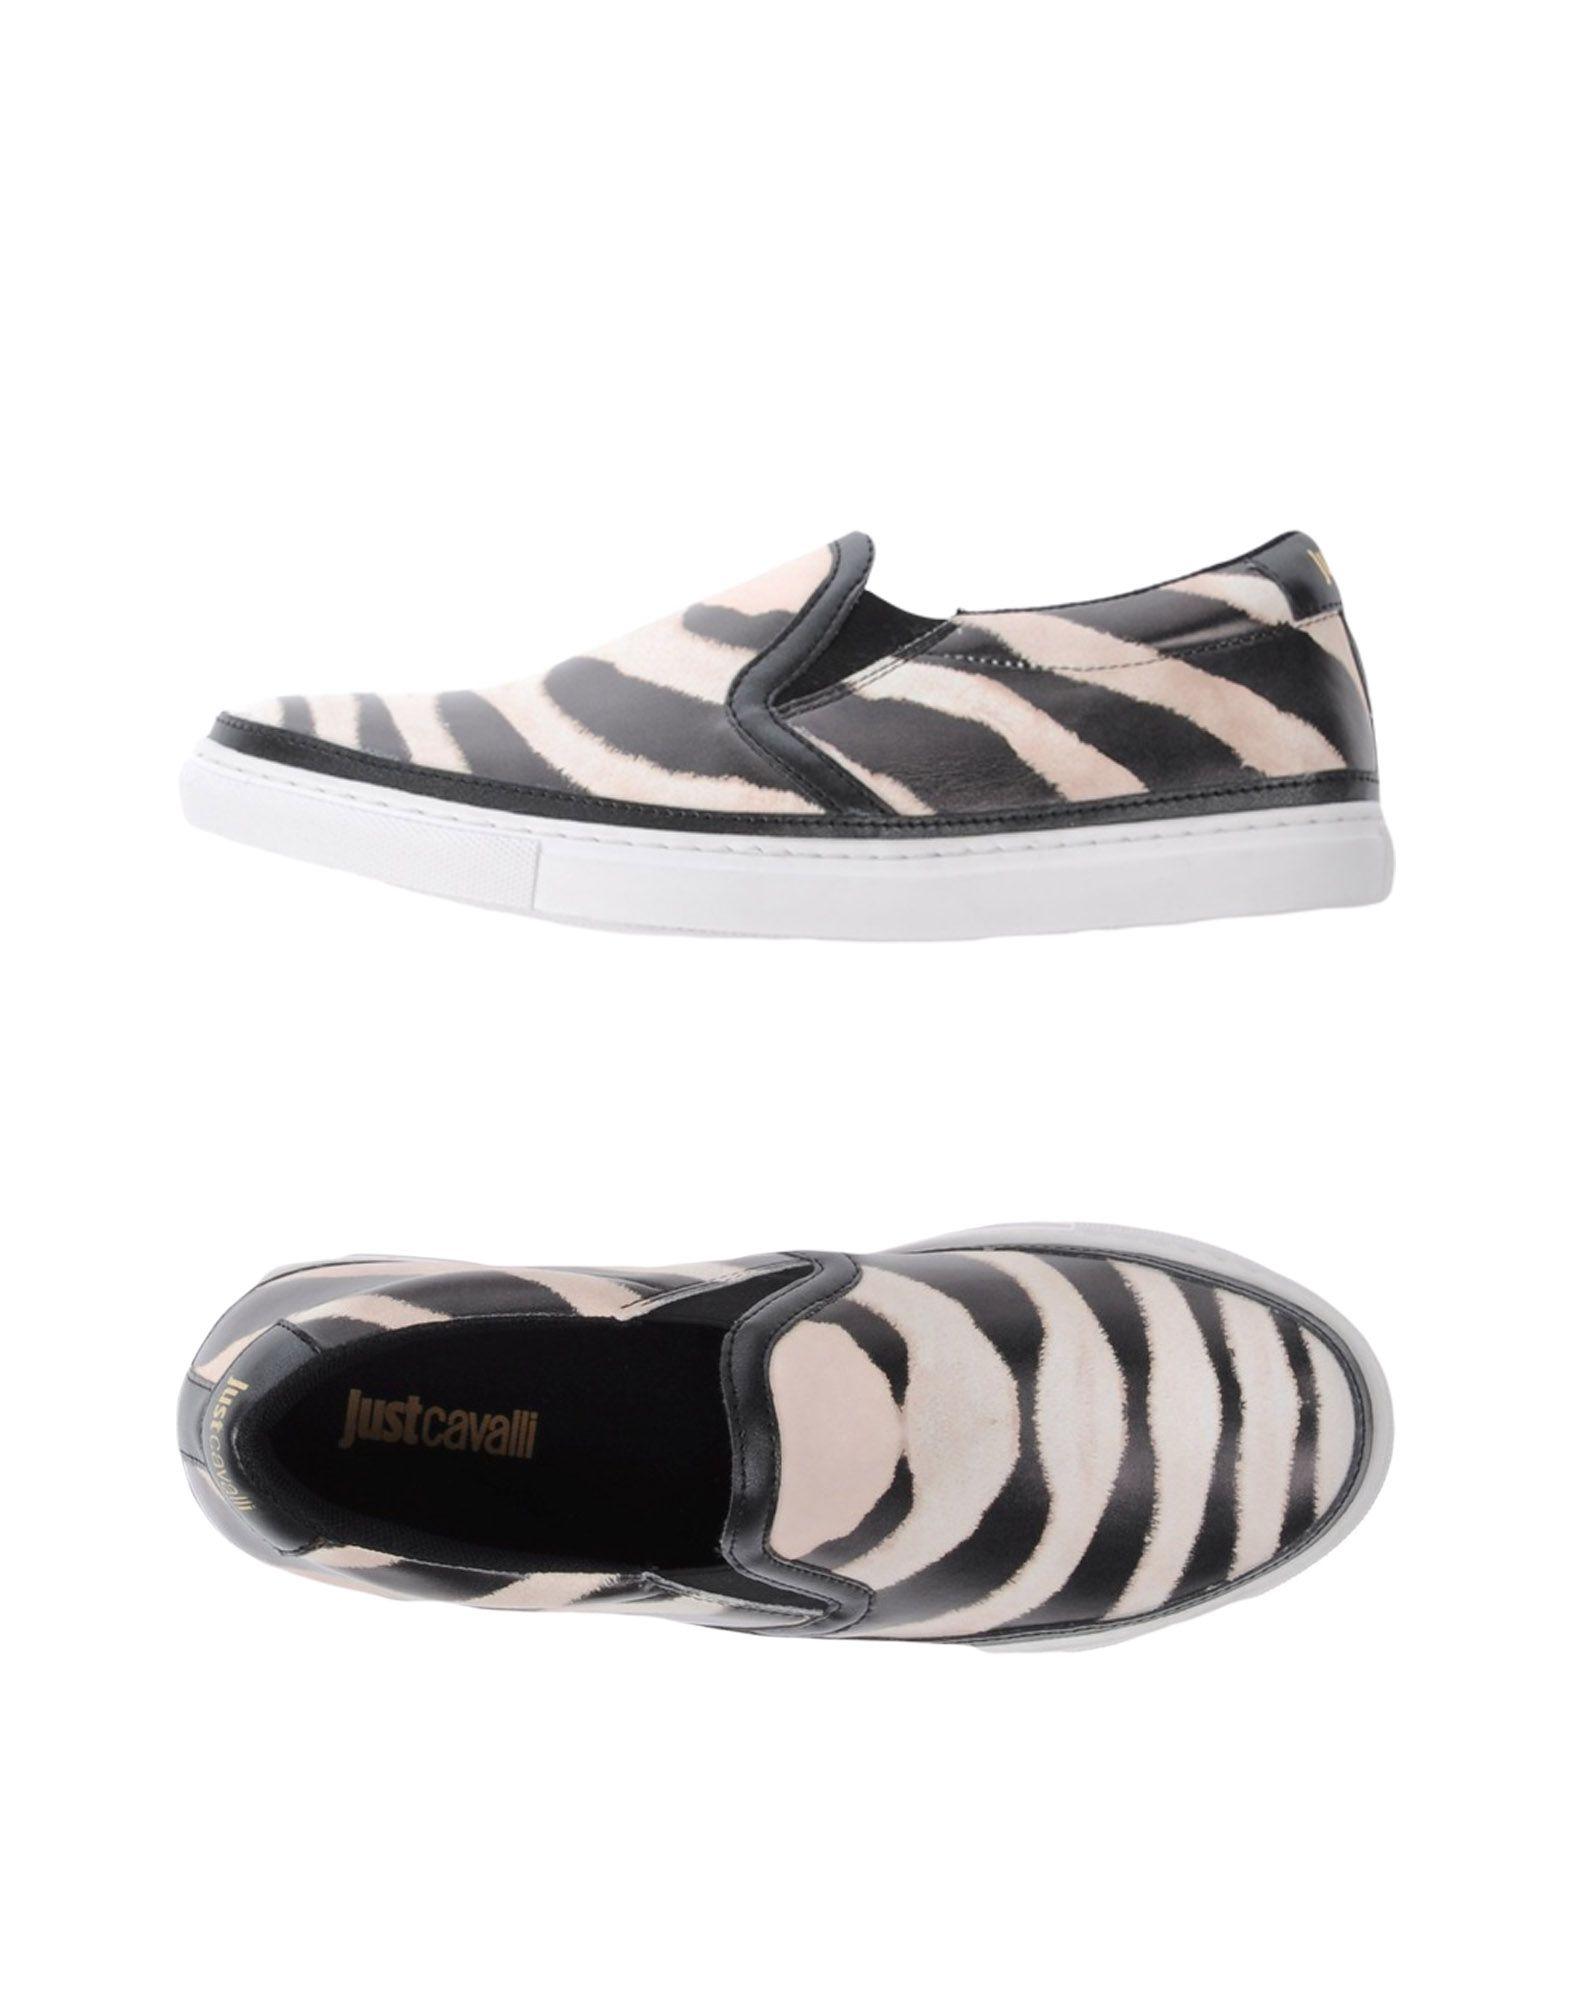 Just Cavalli Sneakers Damen 11295650PX  11295650PX Damen 25841d